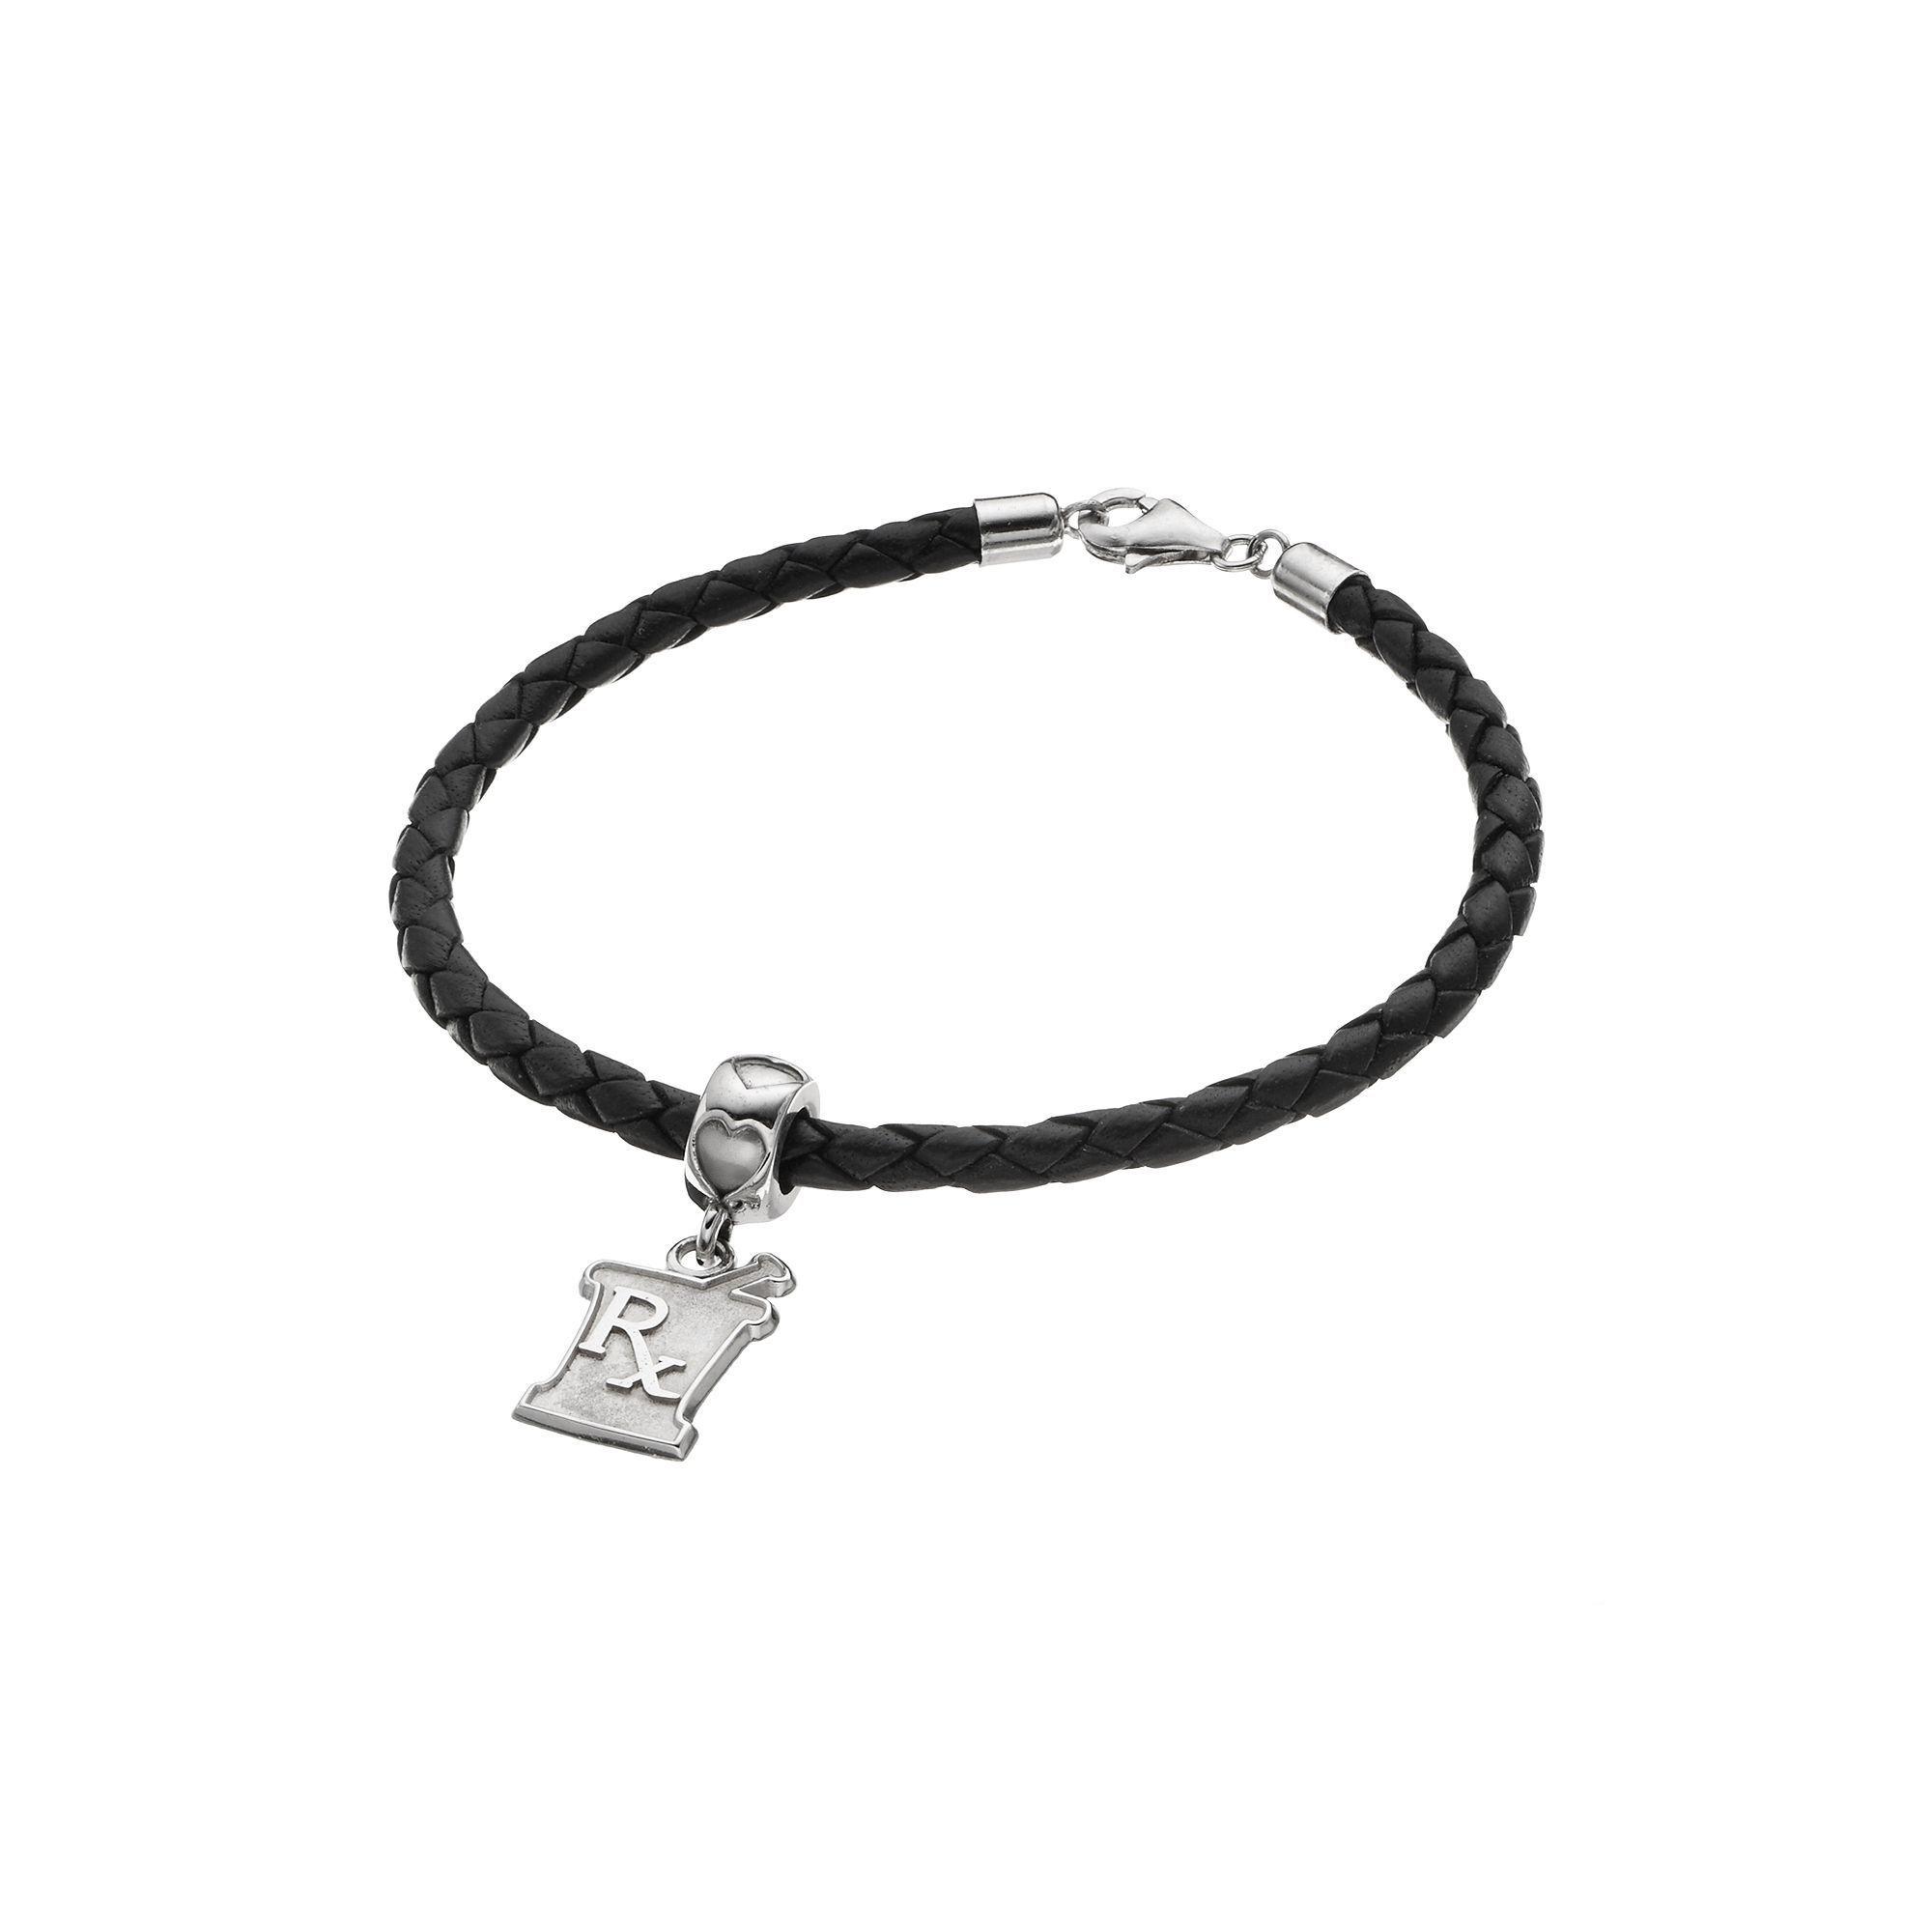 "LogoArt Sterling Silver & Leather ""Rx"" Mortar & Pestle Pharmacist Charm Bracelet, Women's, Size: 7.5"", Grey"